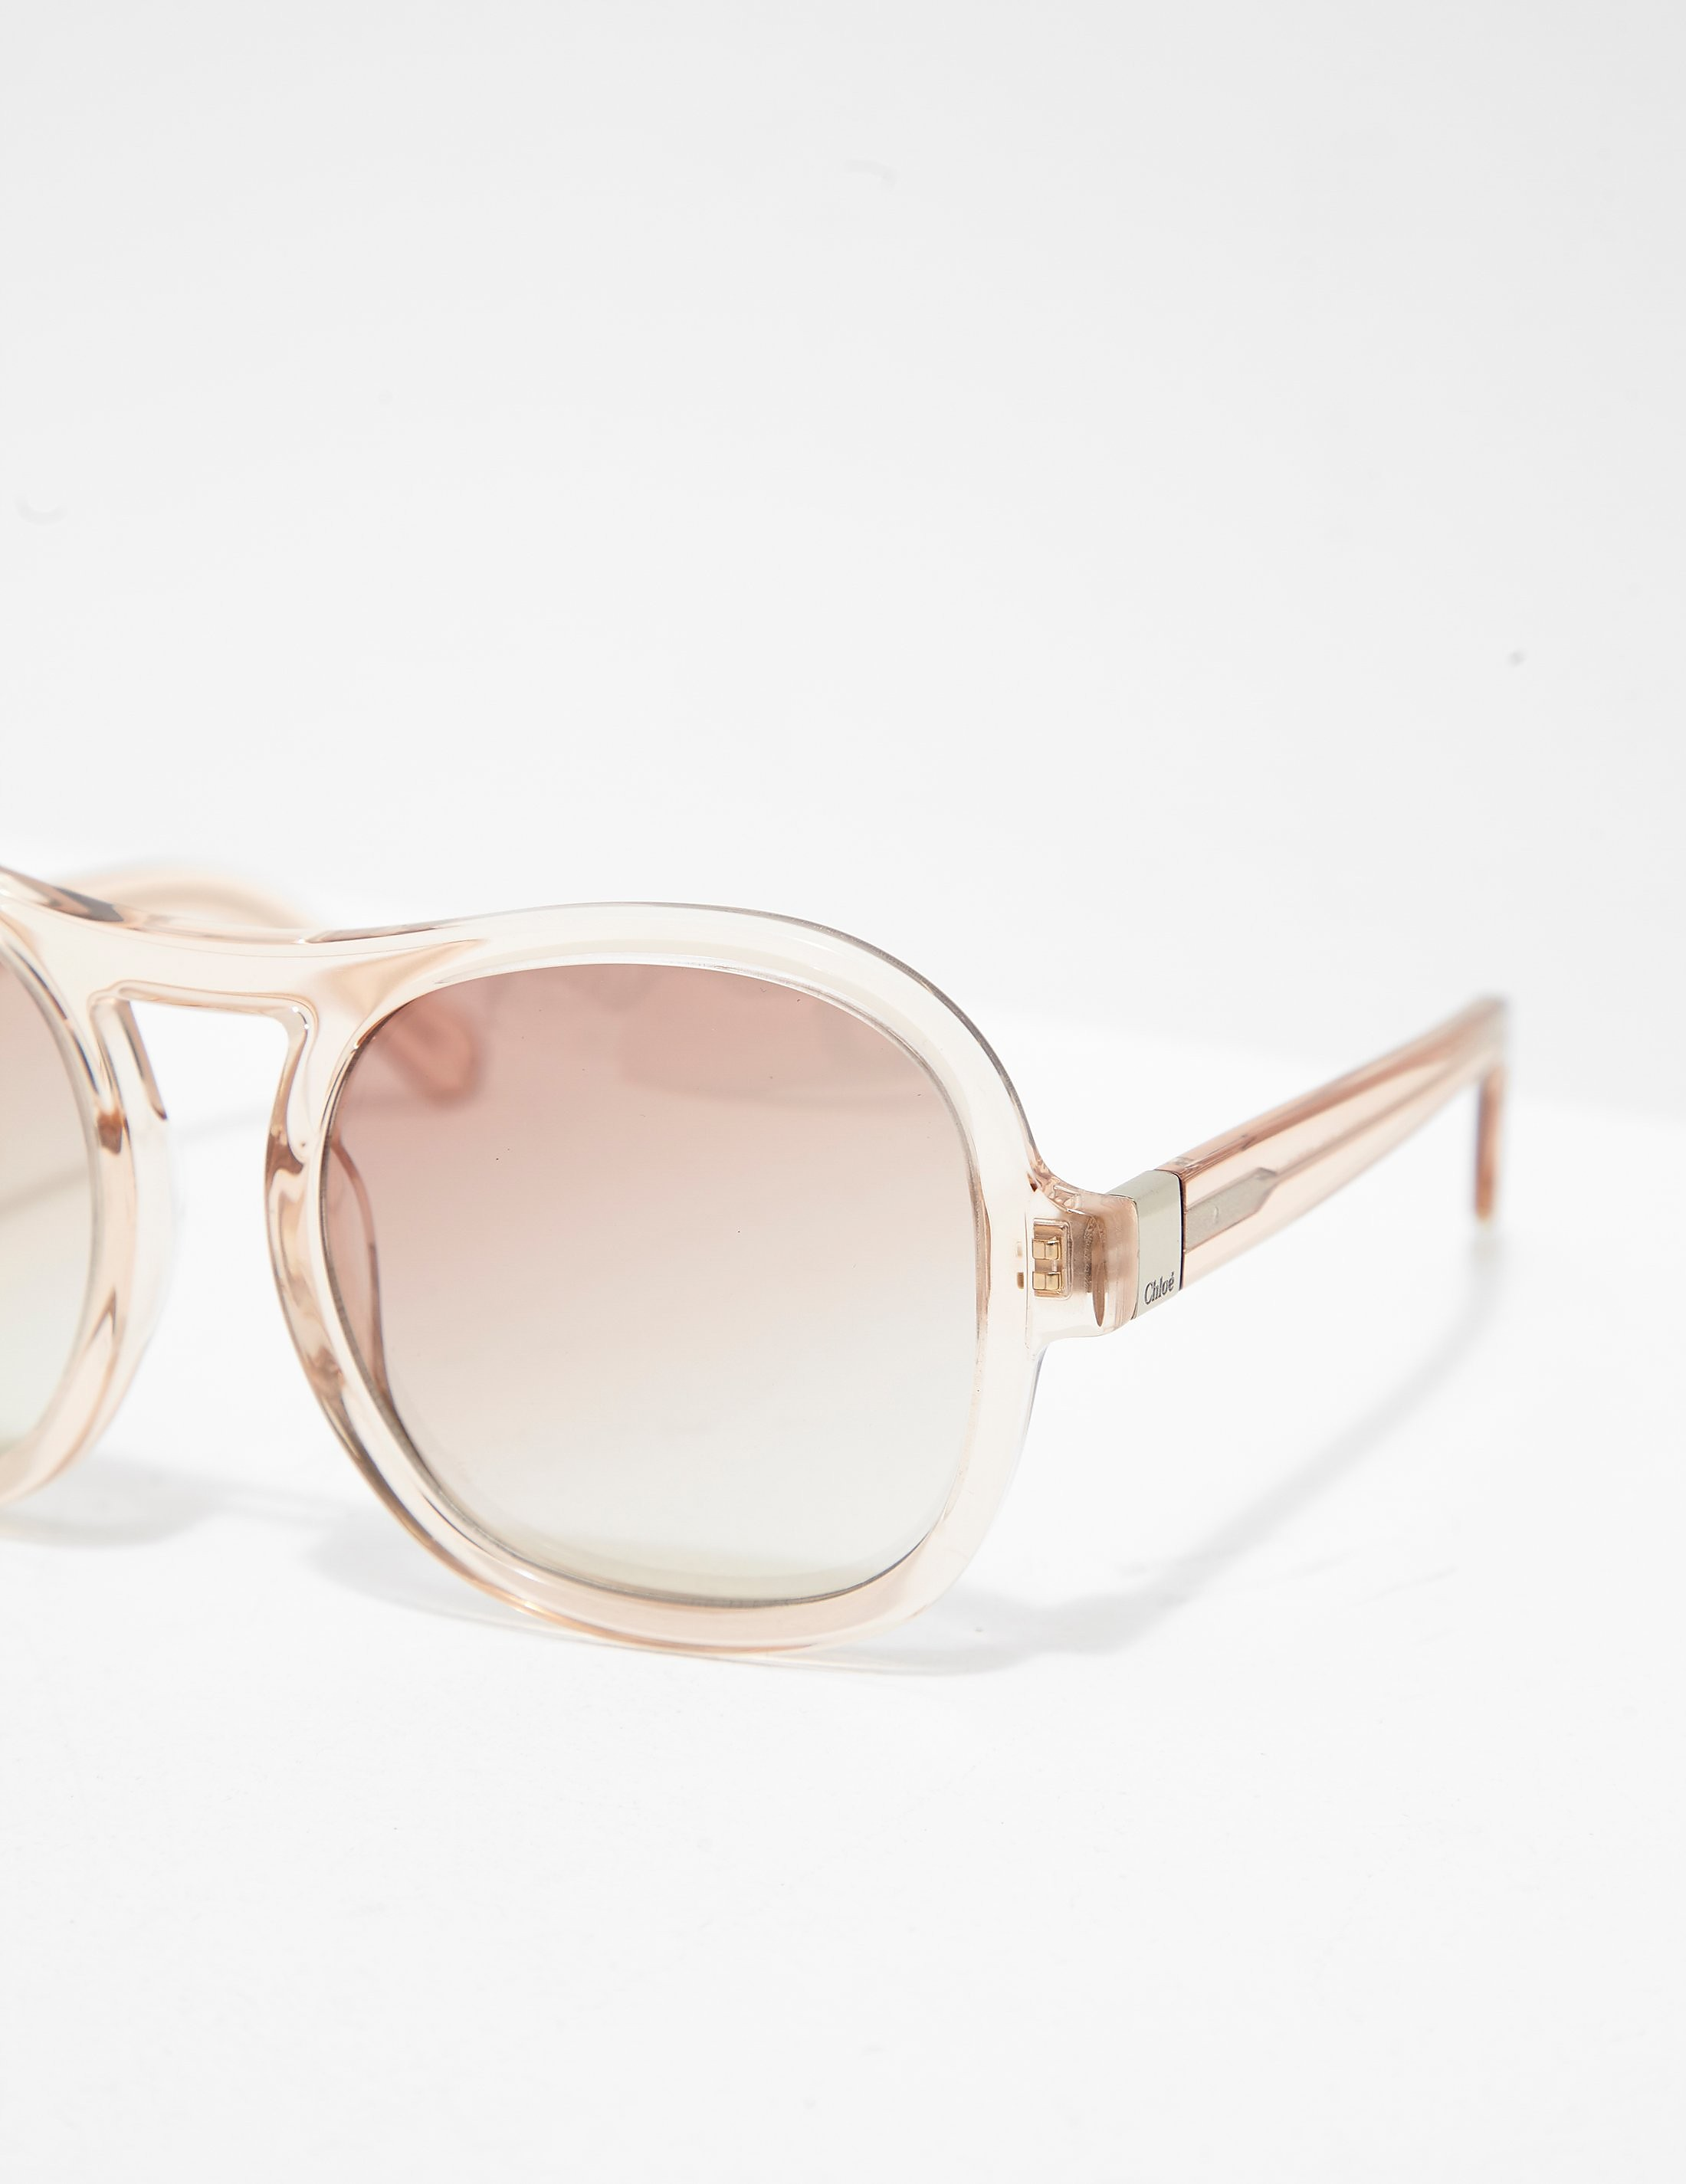 Chloe Plastic Sunglasses - Online Exclusive